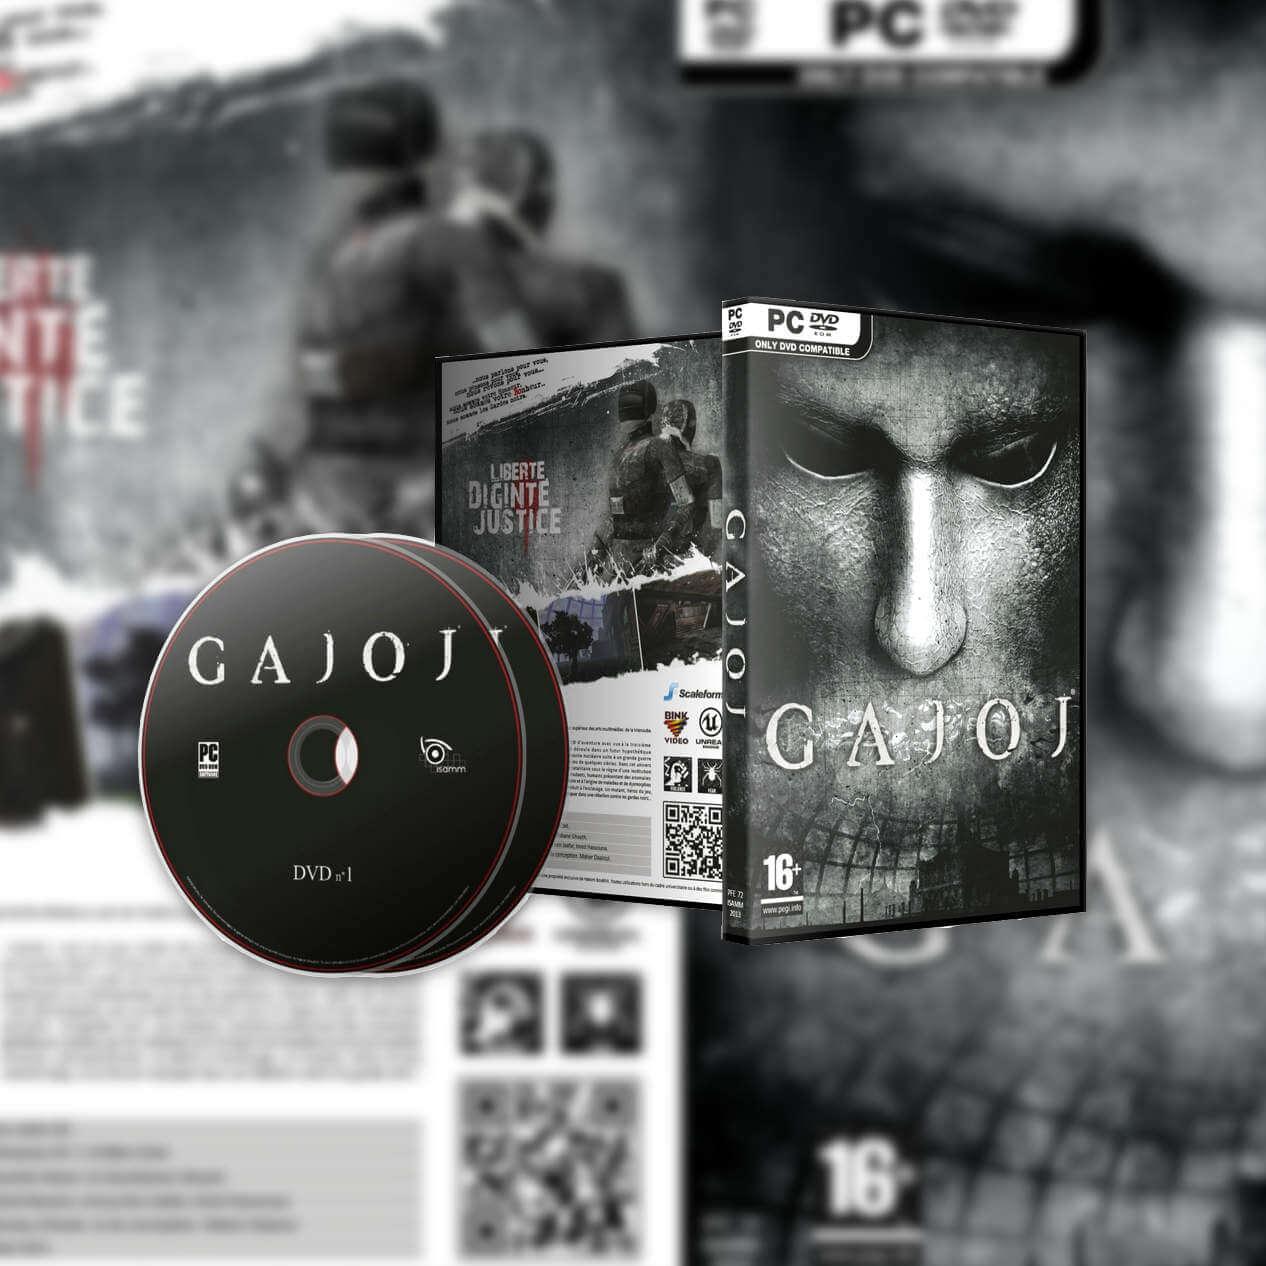 Gajoj Pack Game 3D